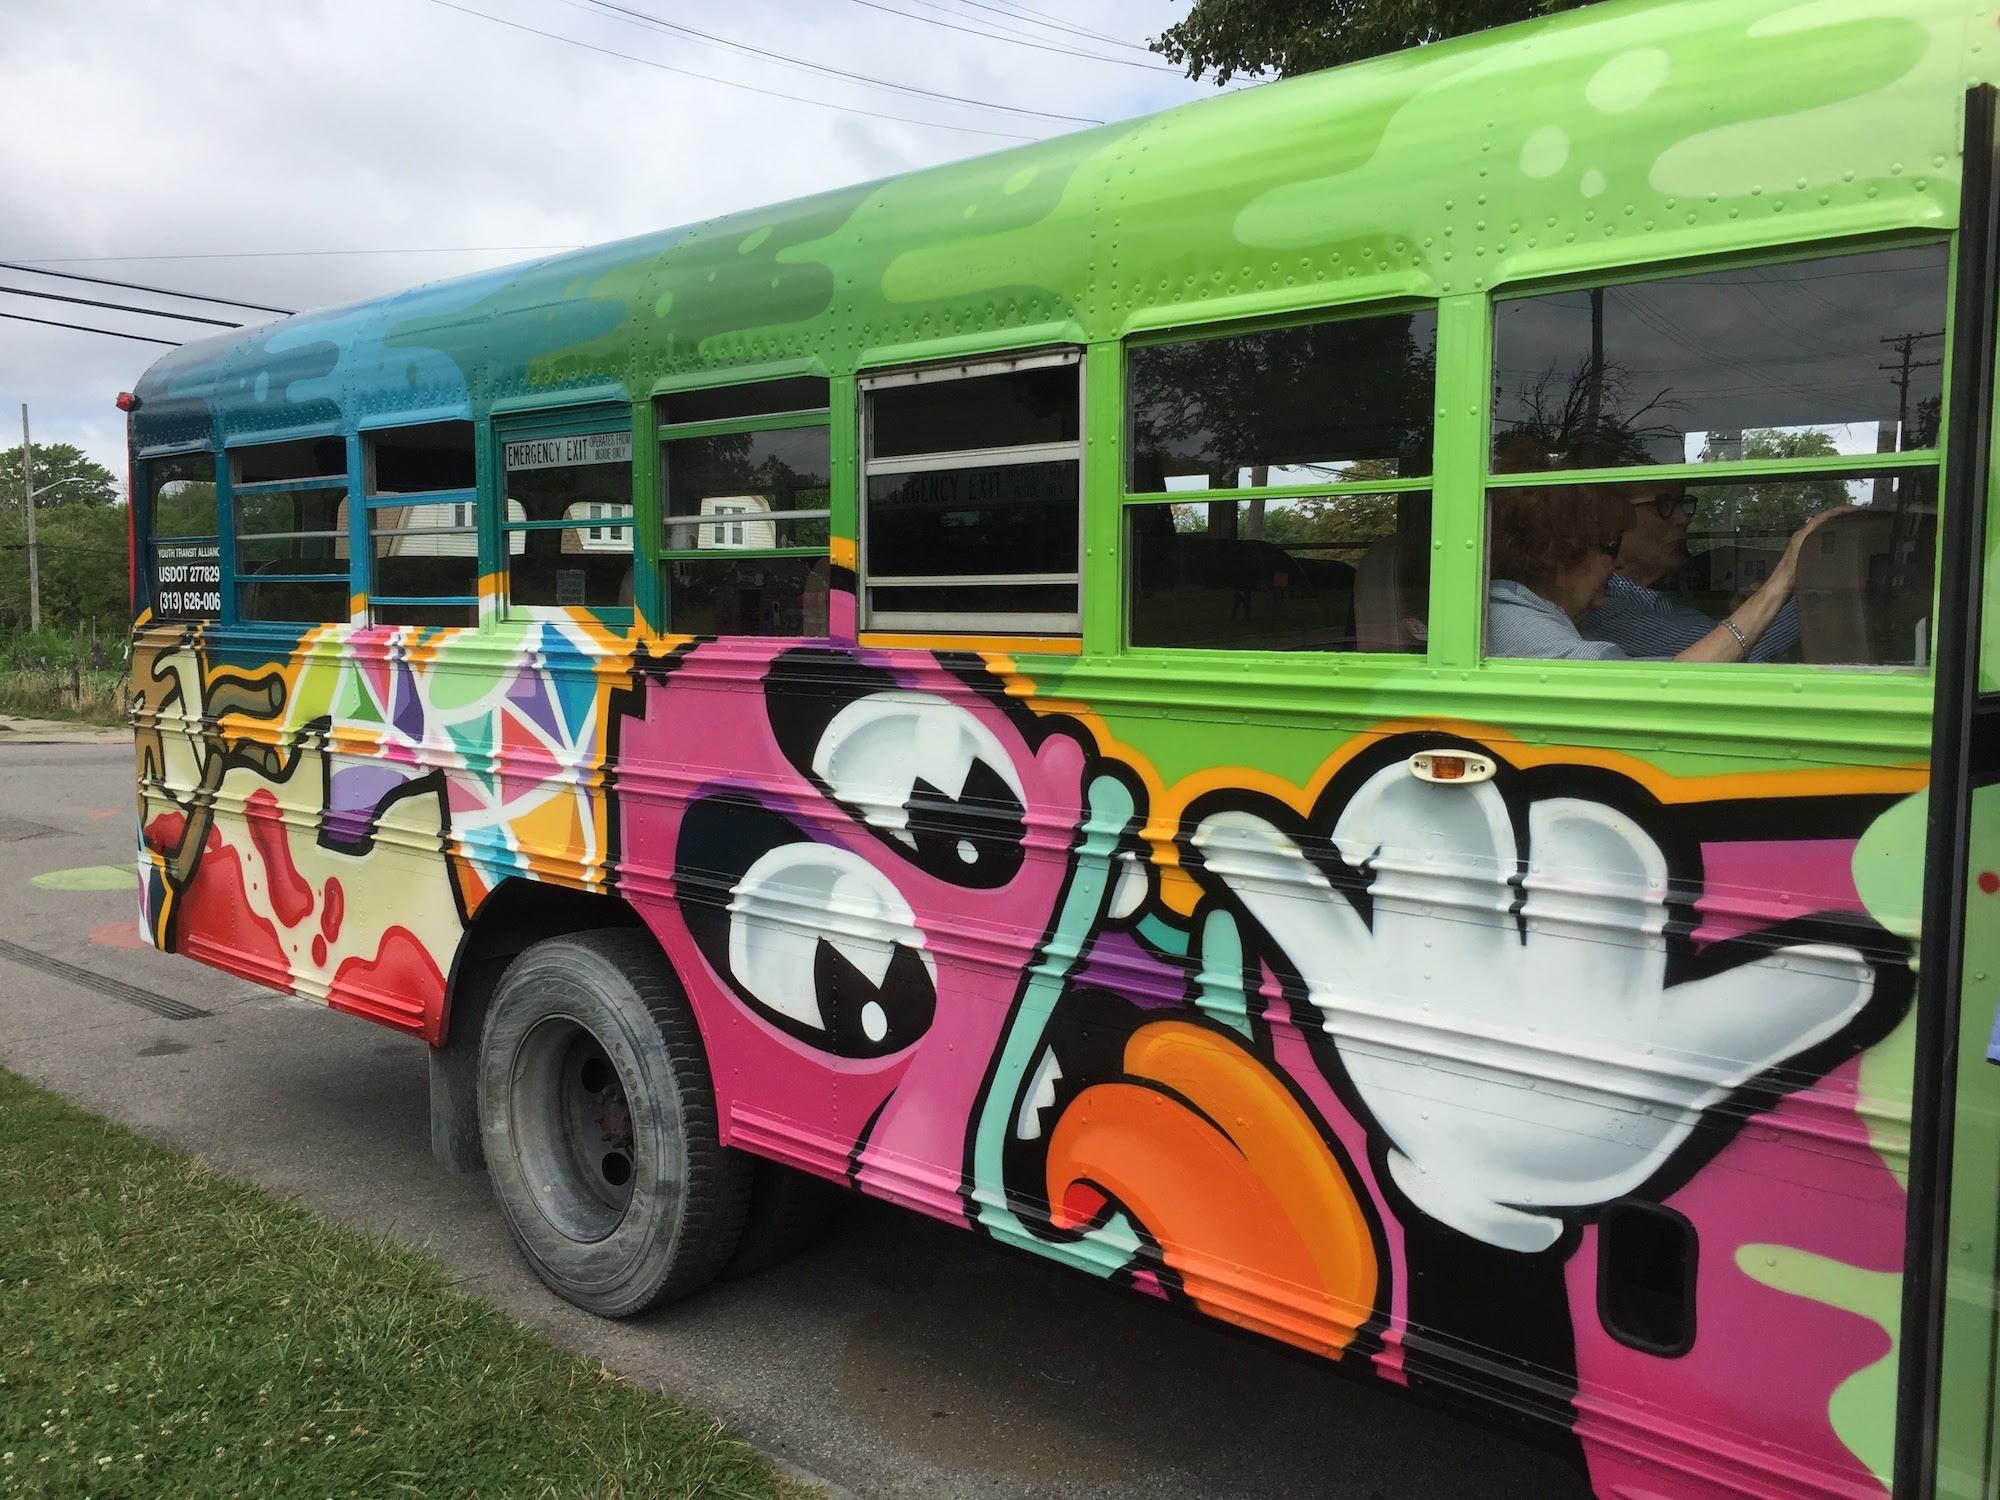 We took a tour bus all around Detroit